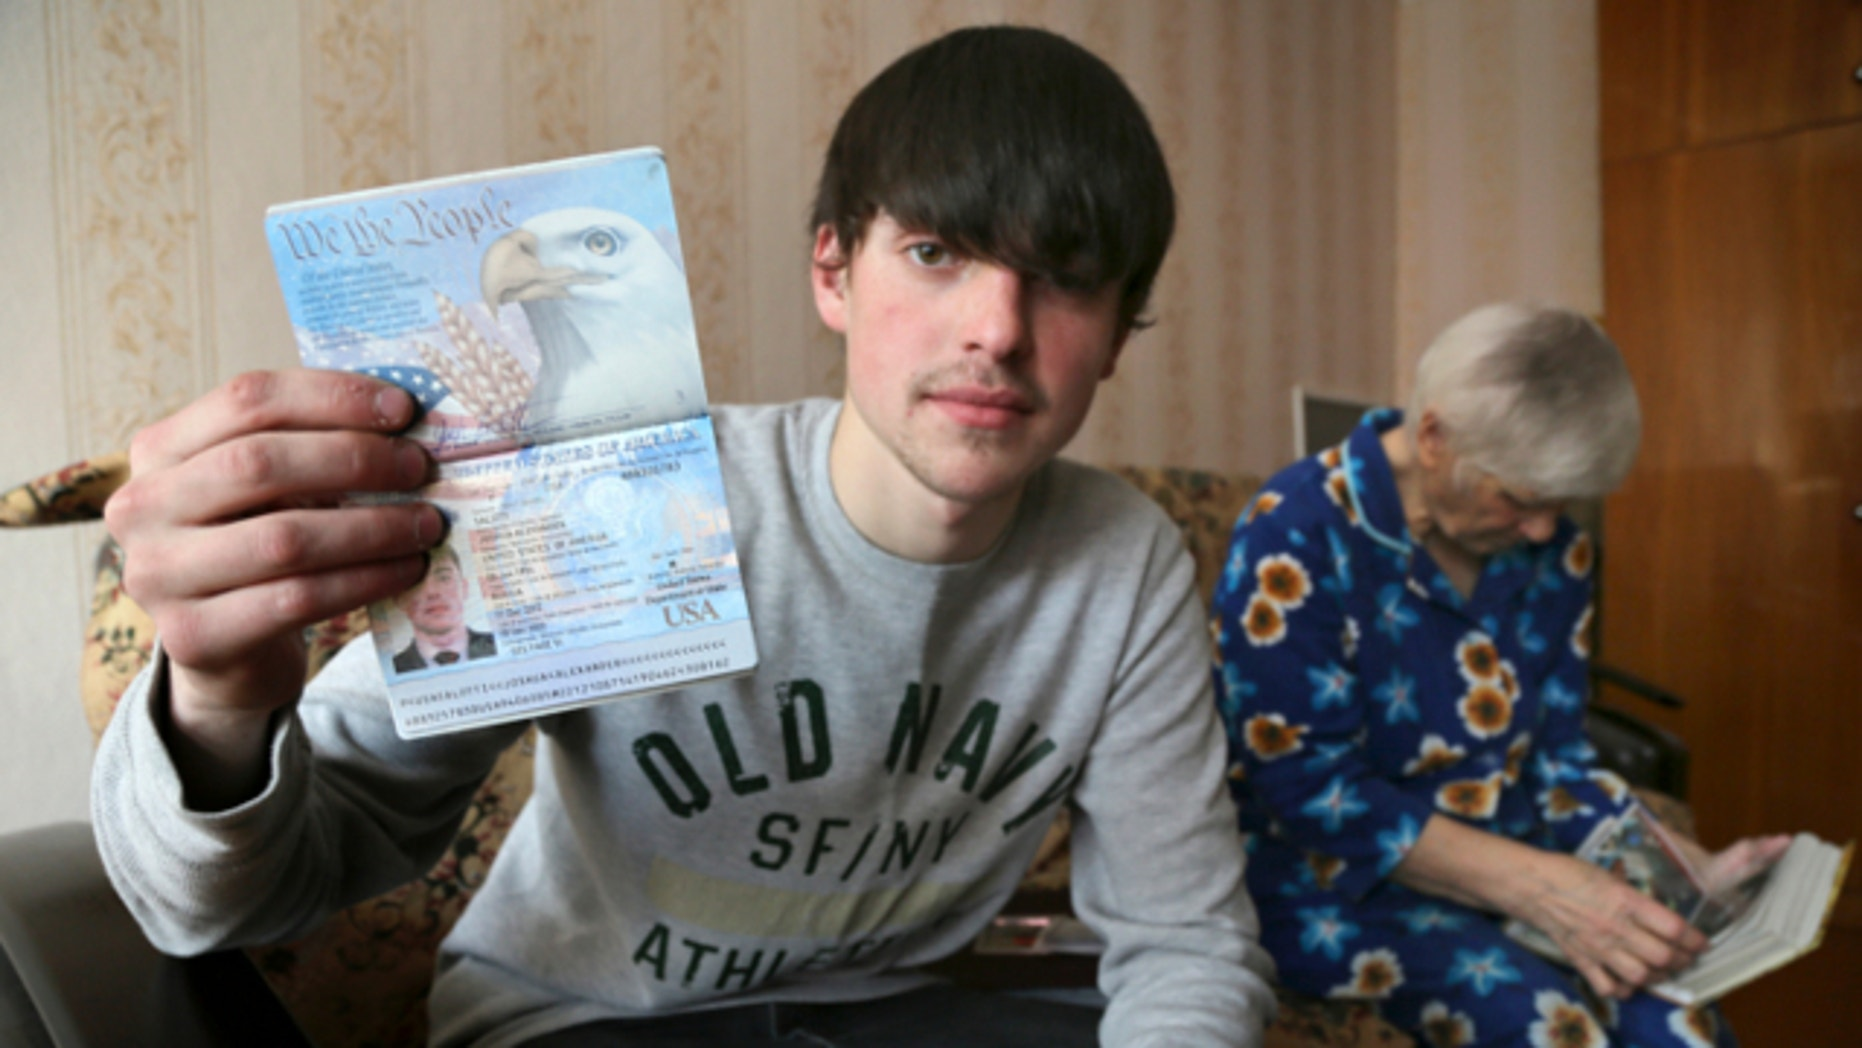 March 20, 2013: Alexander Abnosov shows his American passport to journalists in the Volga river city of Cheboksary, Russia.